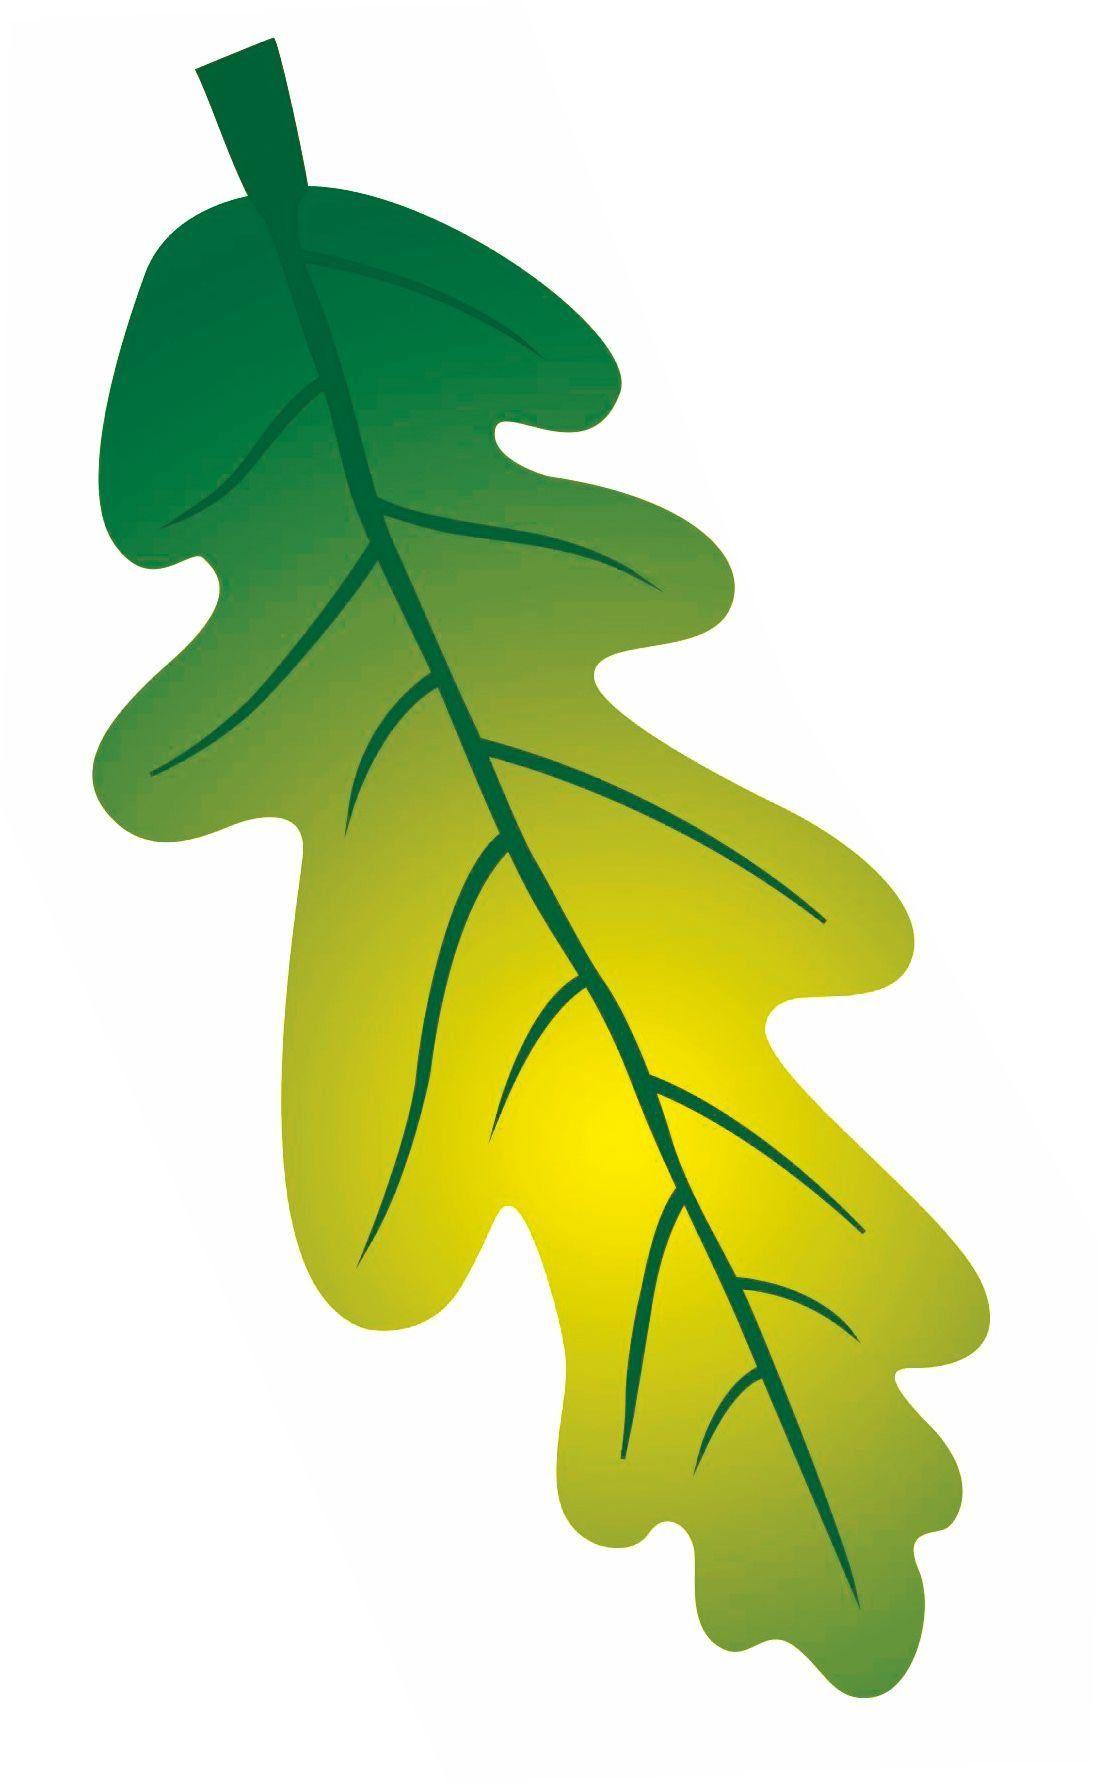 Мини-плакат вырубной Лист дуба зеленый: 144х51 ммВырубные фигуры<br>.<br><br>Год: 2017<br>Серия: Вырубные фигуры для оформления<br>Высота: 51<br>Ширина: 144<br>Переплёт: набор